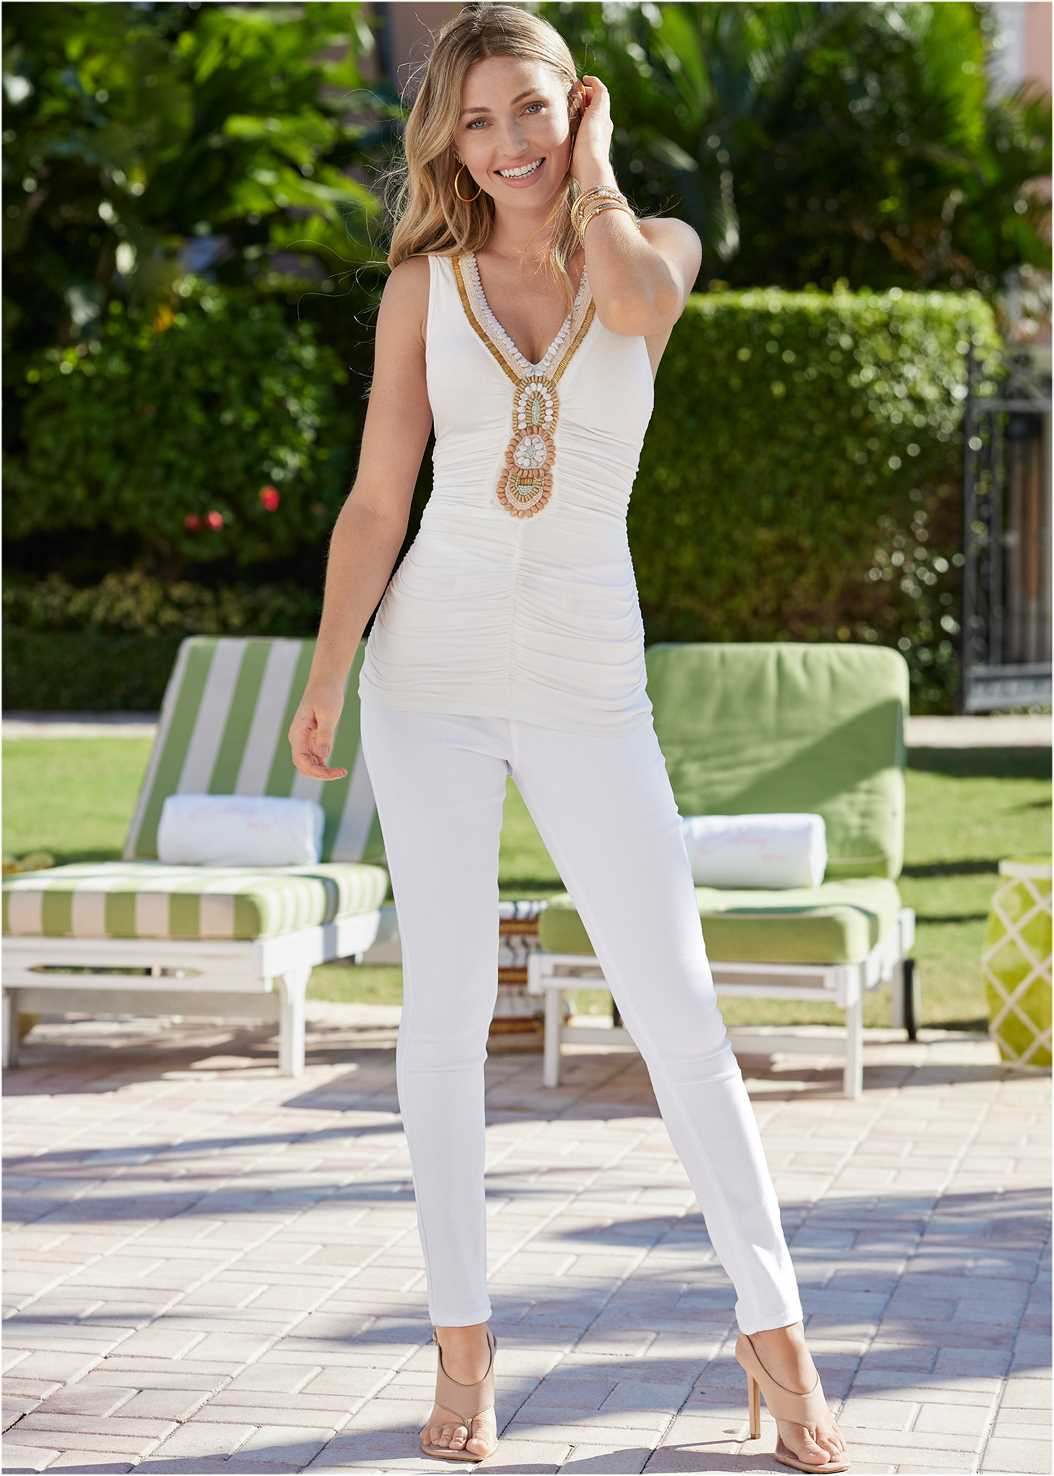 Bum Lifter Jeans,Embellished Neckline Top,Button Up Bodysuit,High Heel Strappy Sandals